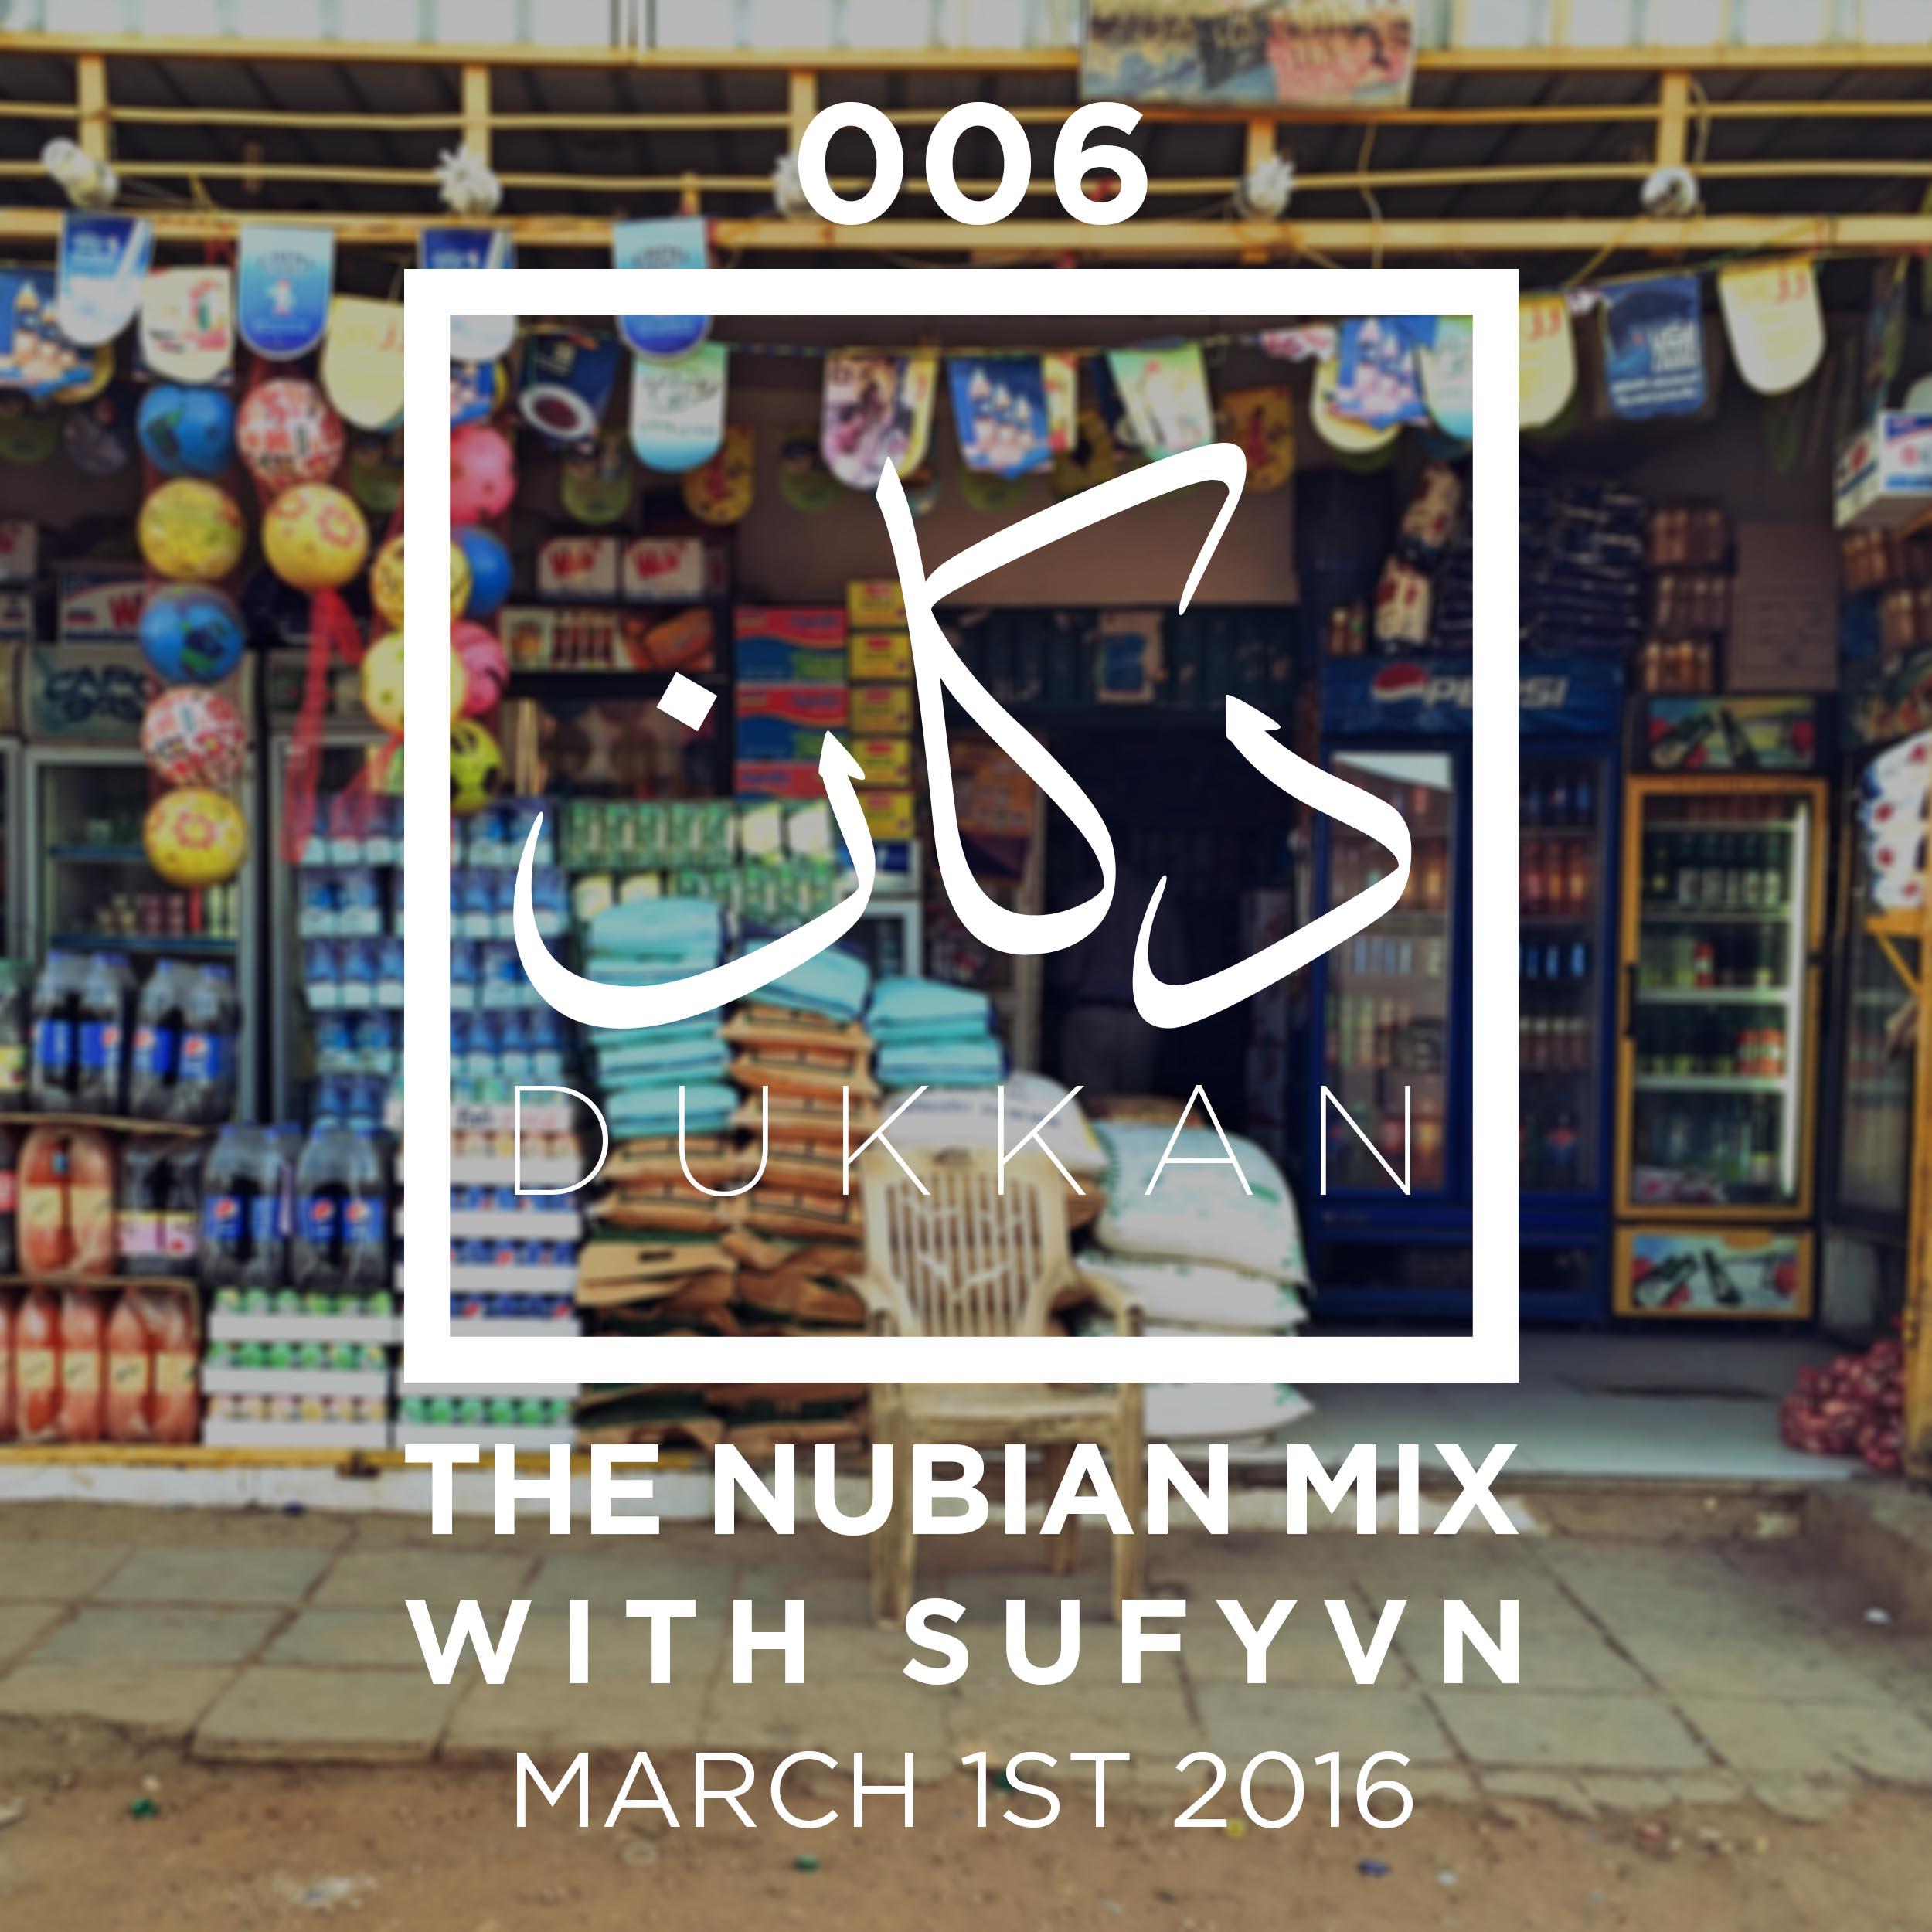 the nubian mix